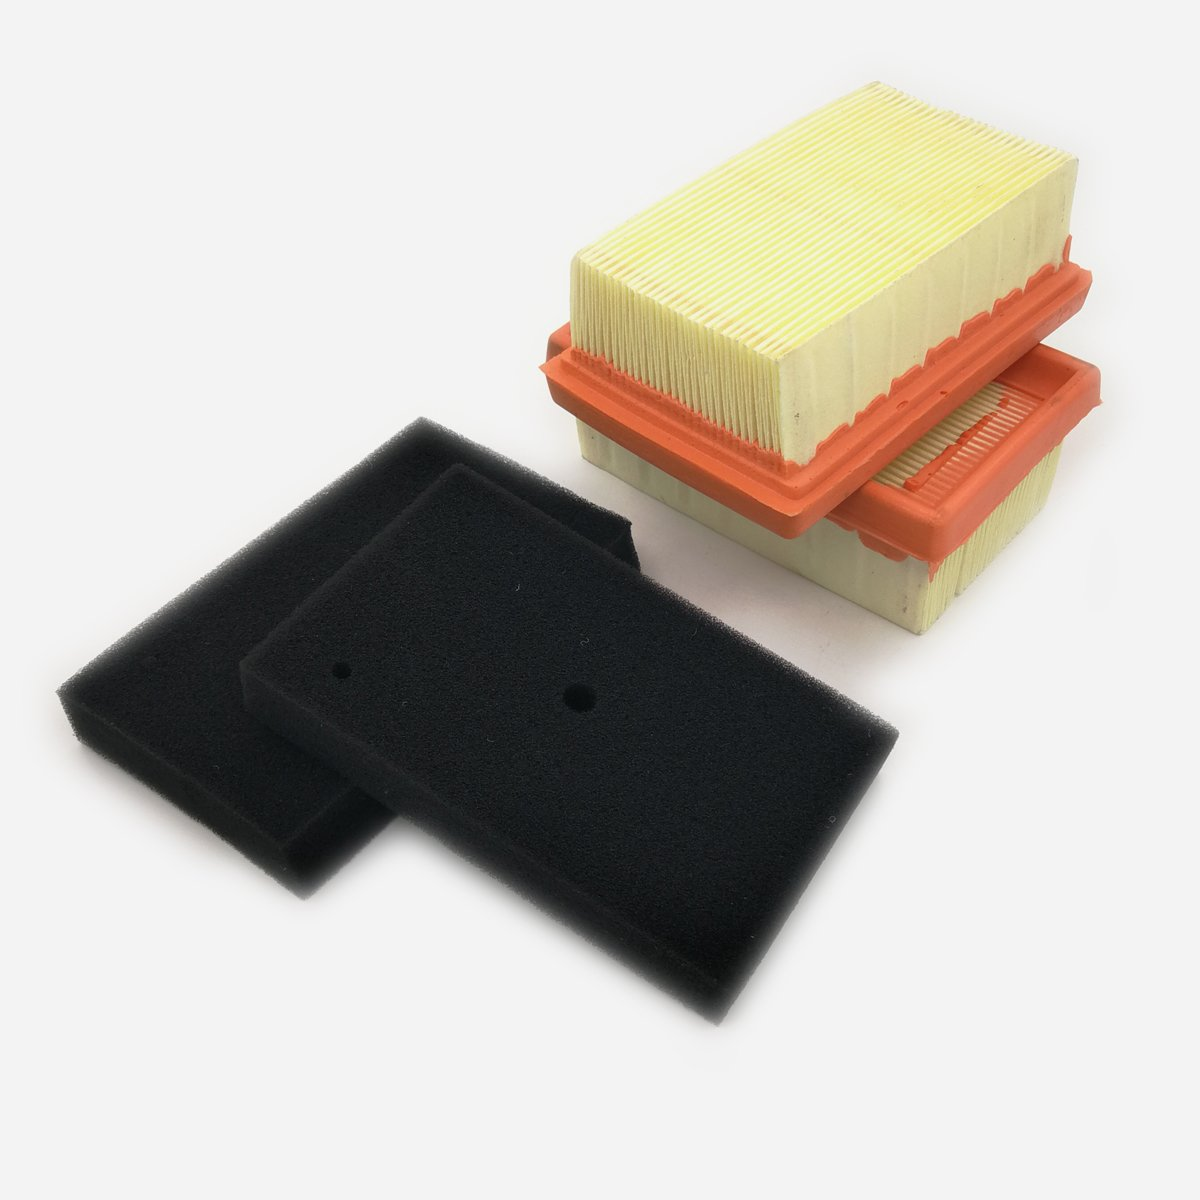 Air Filter Pre Cleaner for STIHL BR350 BR430 BR450 SR430 SR450 Blower